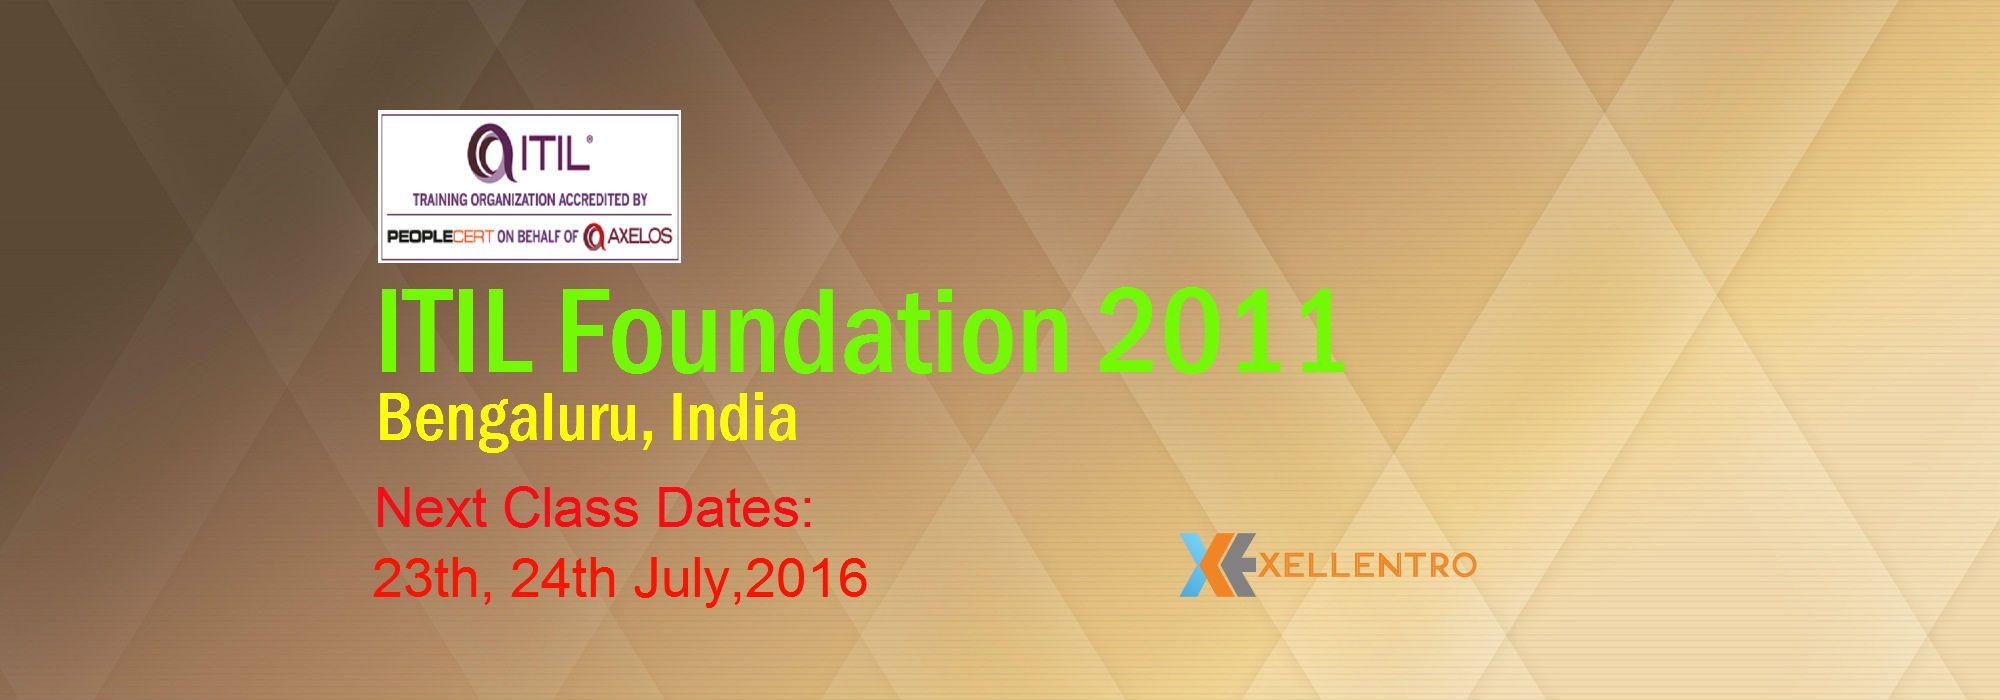 Itil Foundation 2011 Bangalore India Itil Foundation Certification